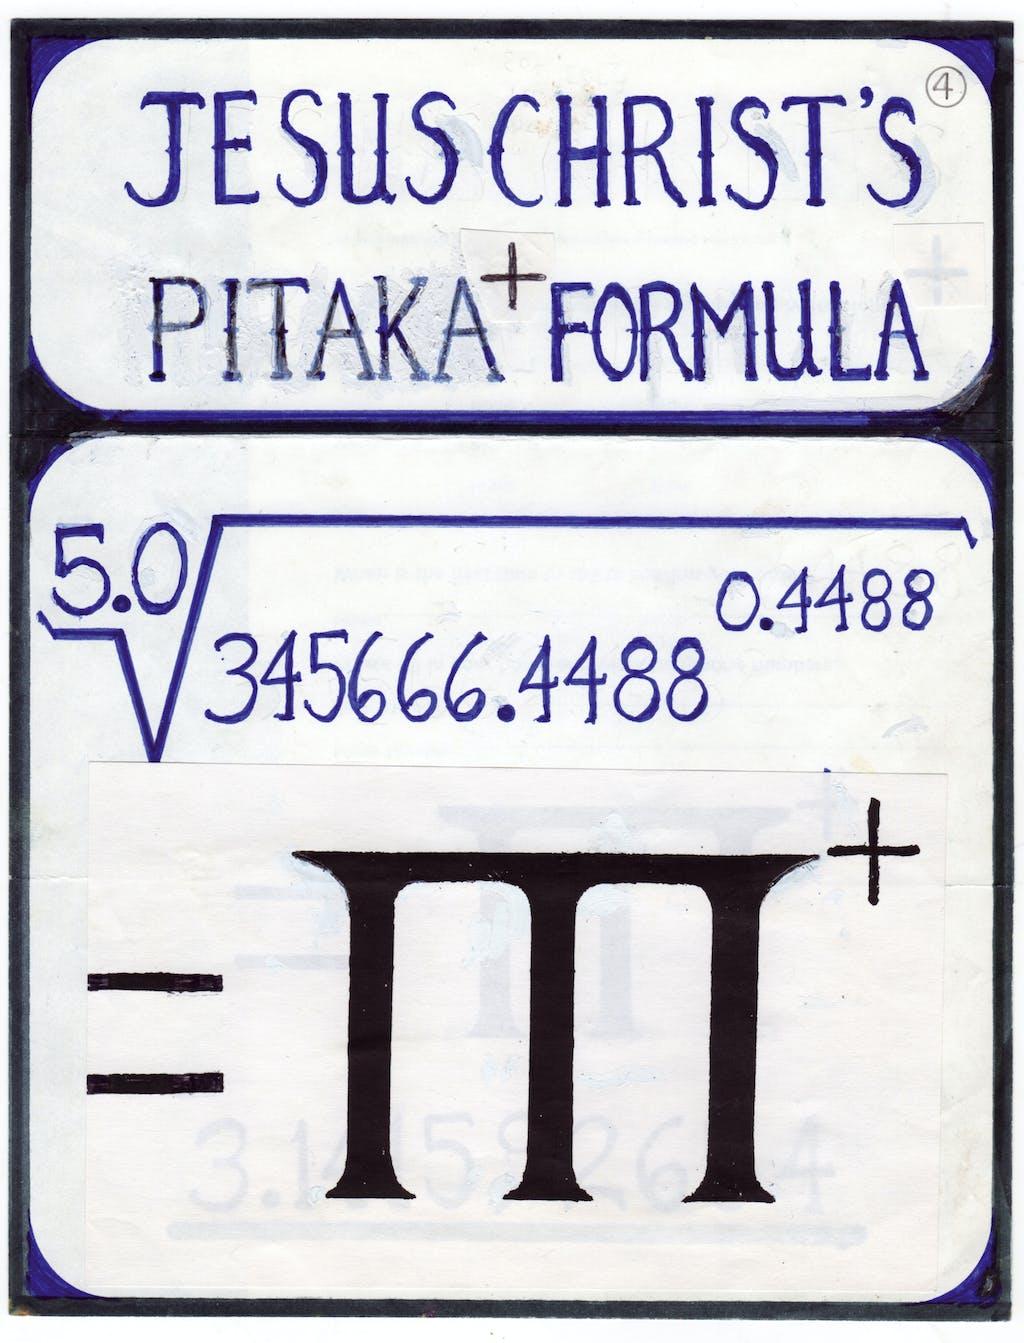 sans titre, recto-verso (jesus christs pitaka + formula) - © christian berst — art brut